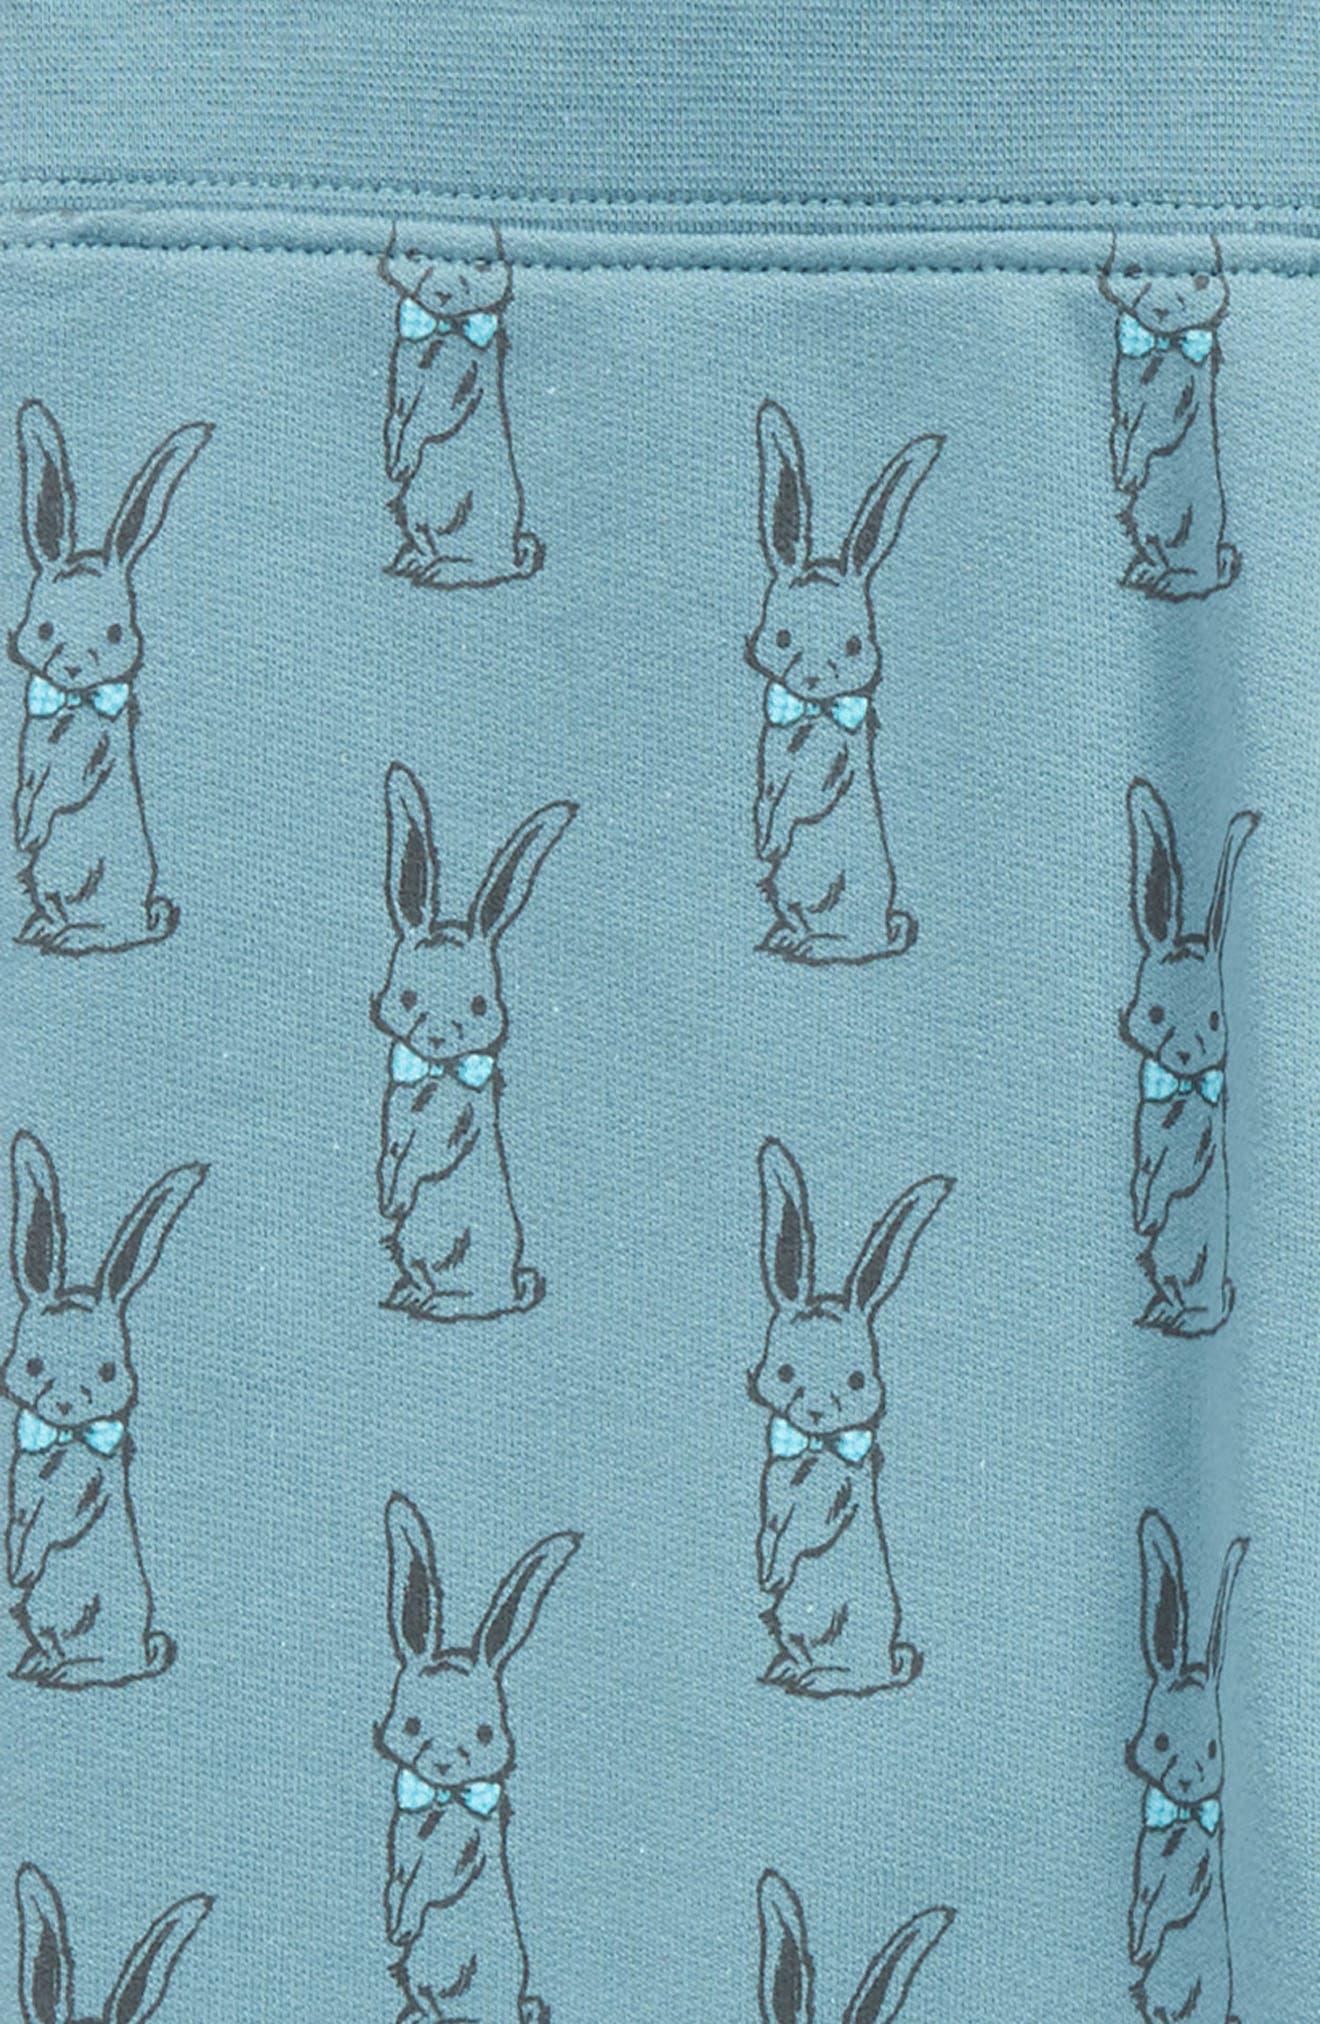 Peek Bunny Print Jogger Pants,                             Alternate thumbnail 2, color,                             Teal